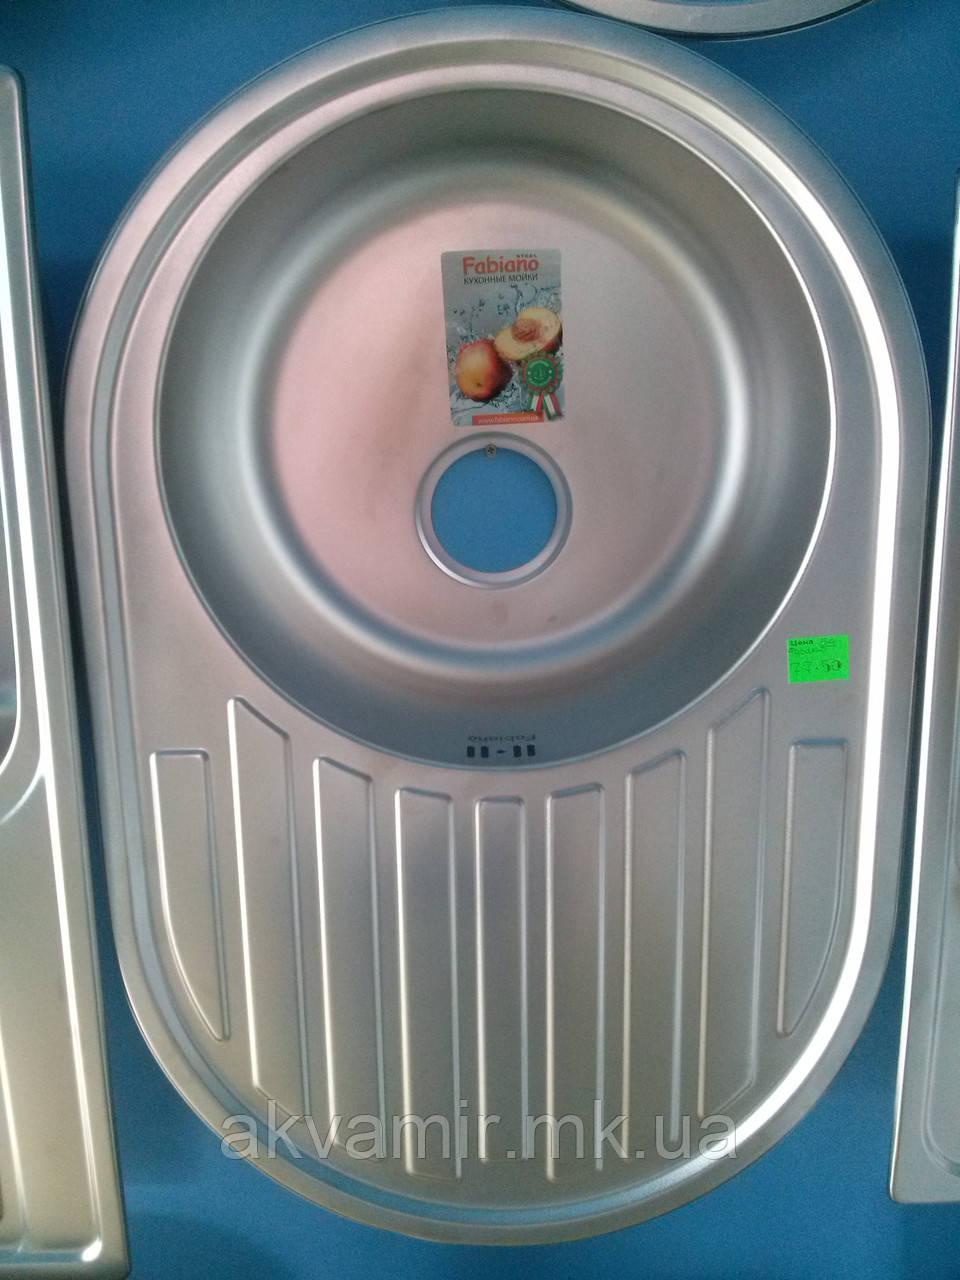 Мийка Fabiano 77x50 Microdecor нерж. сталь 0.8 мм (Туреччина)